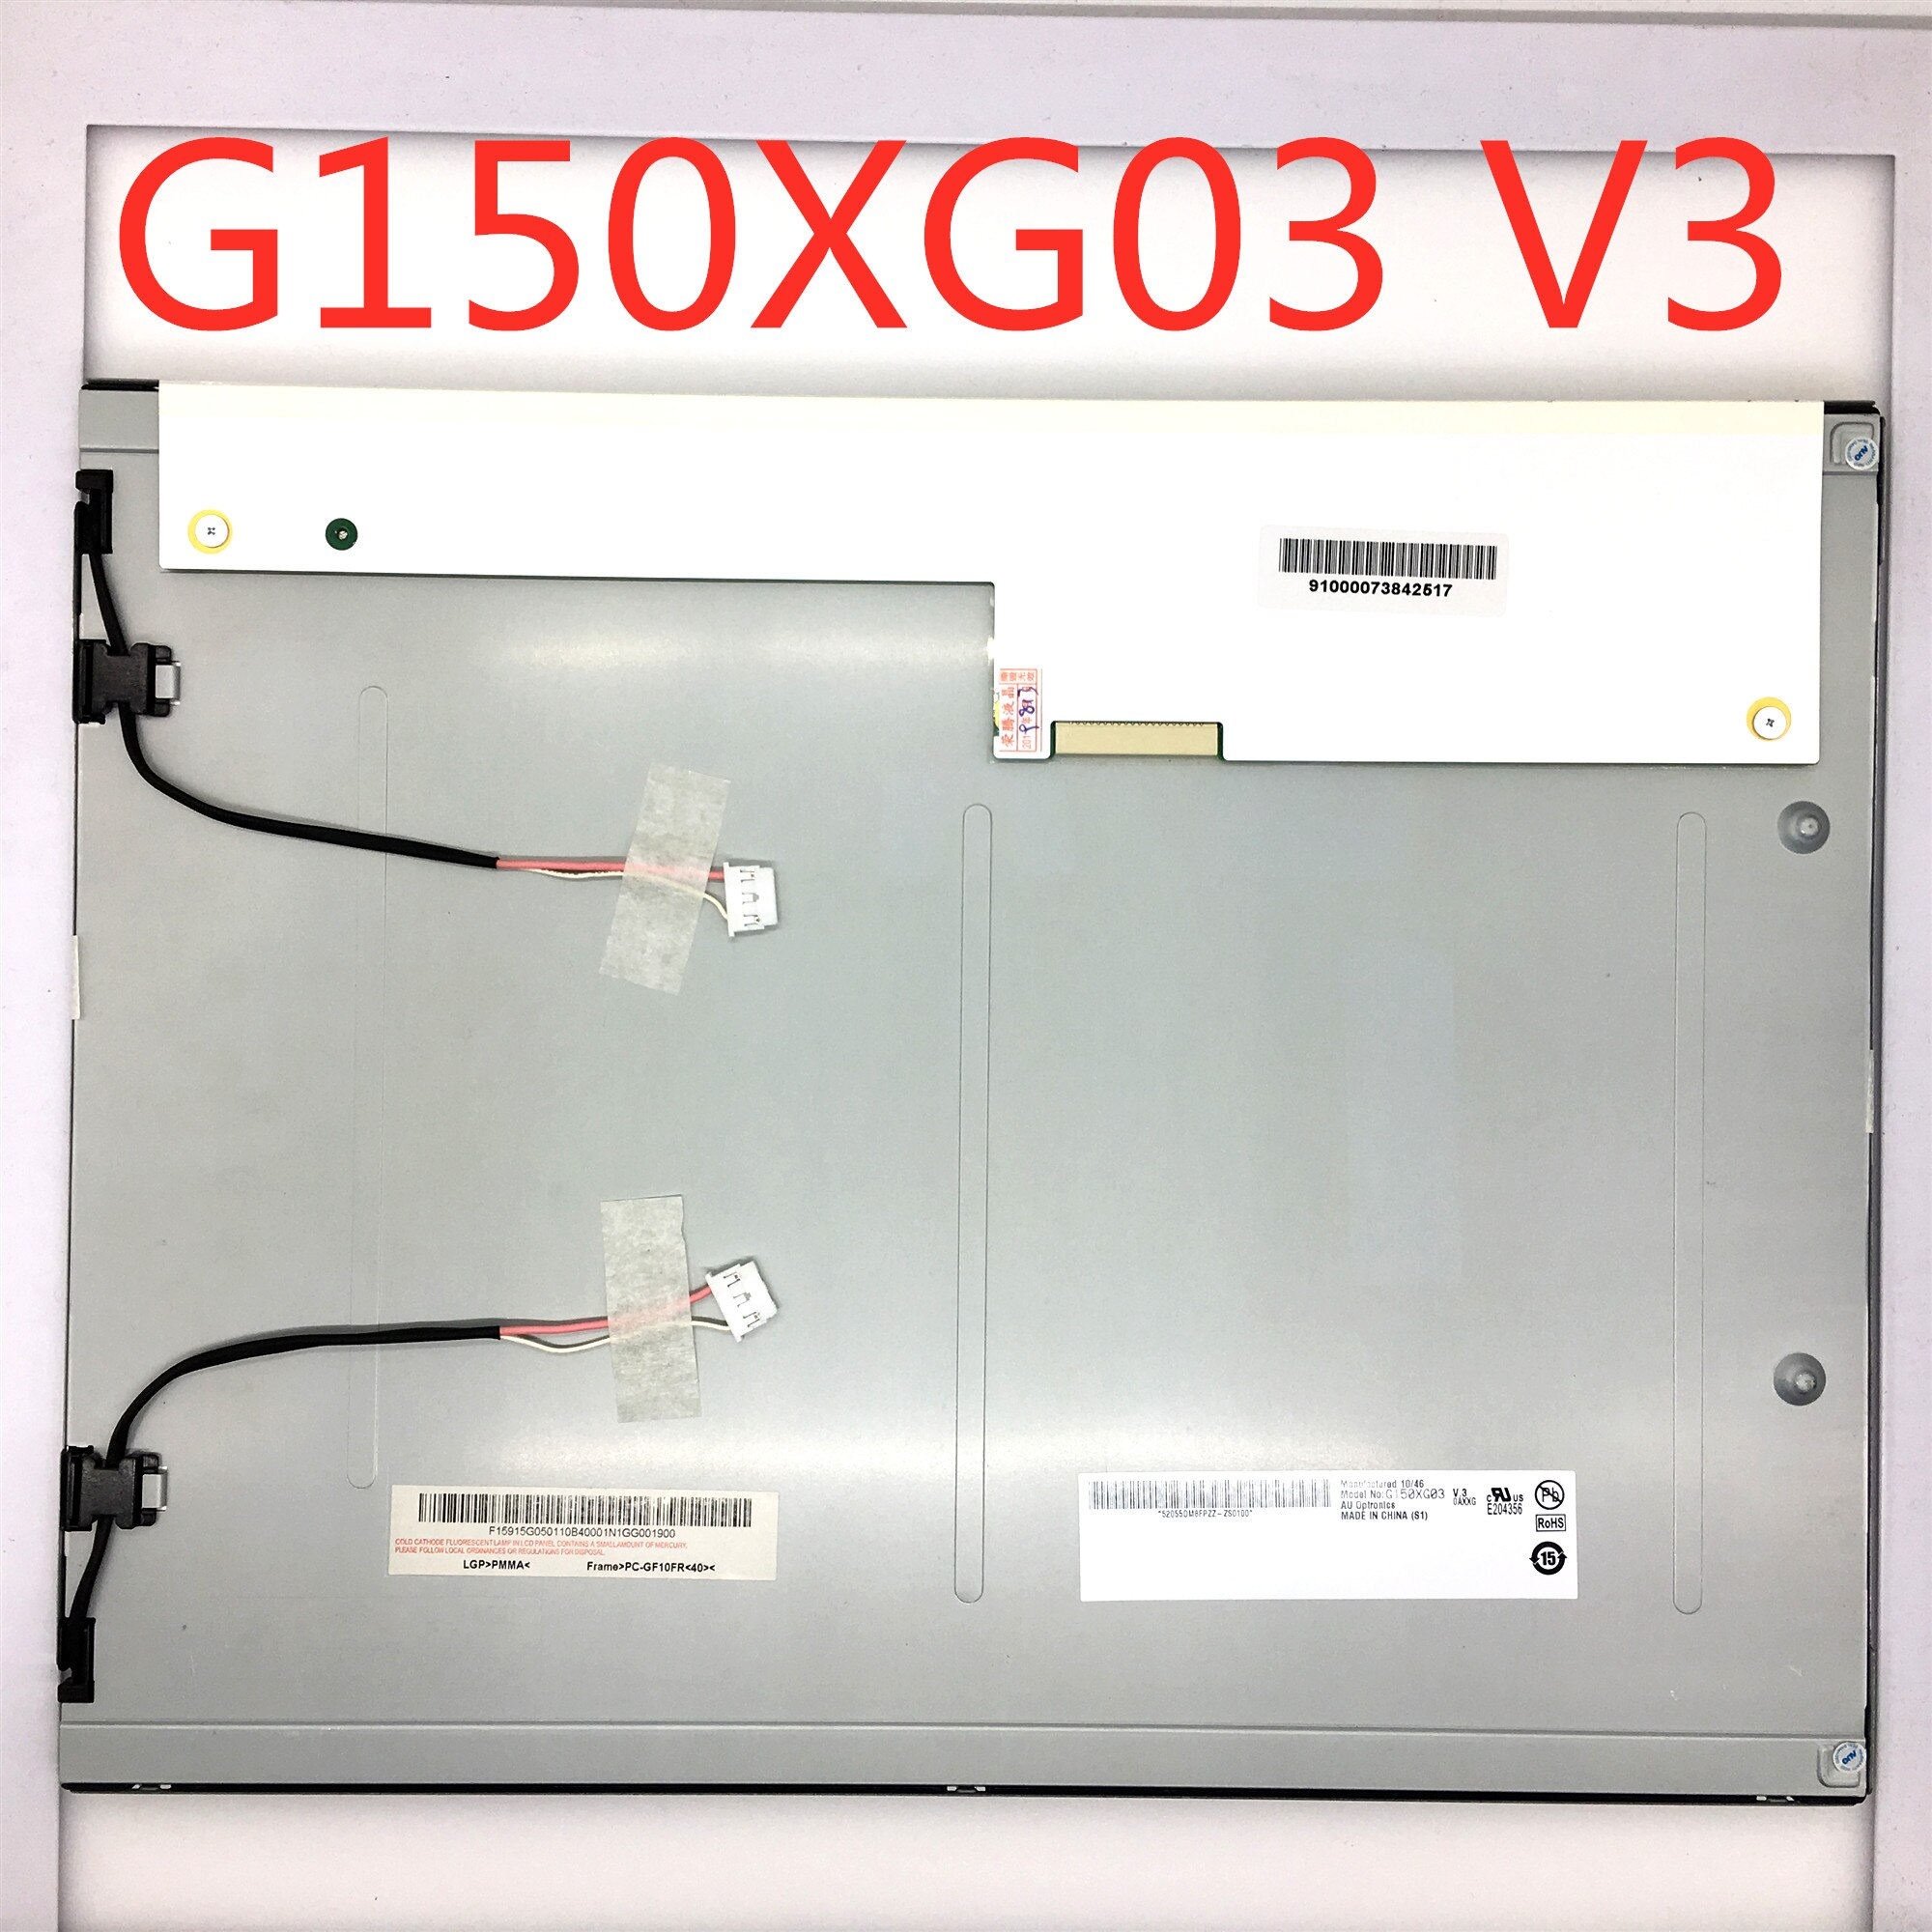 Puede proporcionar Video de prueba, 90 días de garantía G150XG03 V3 15 pulgadas panel lcd G150XG03 V.3